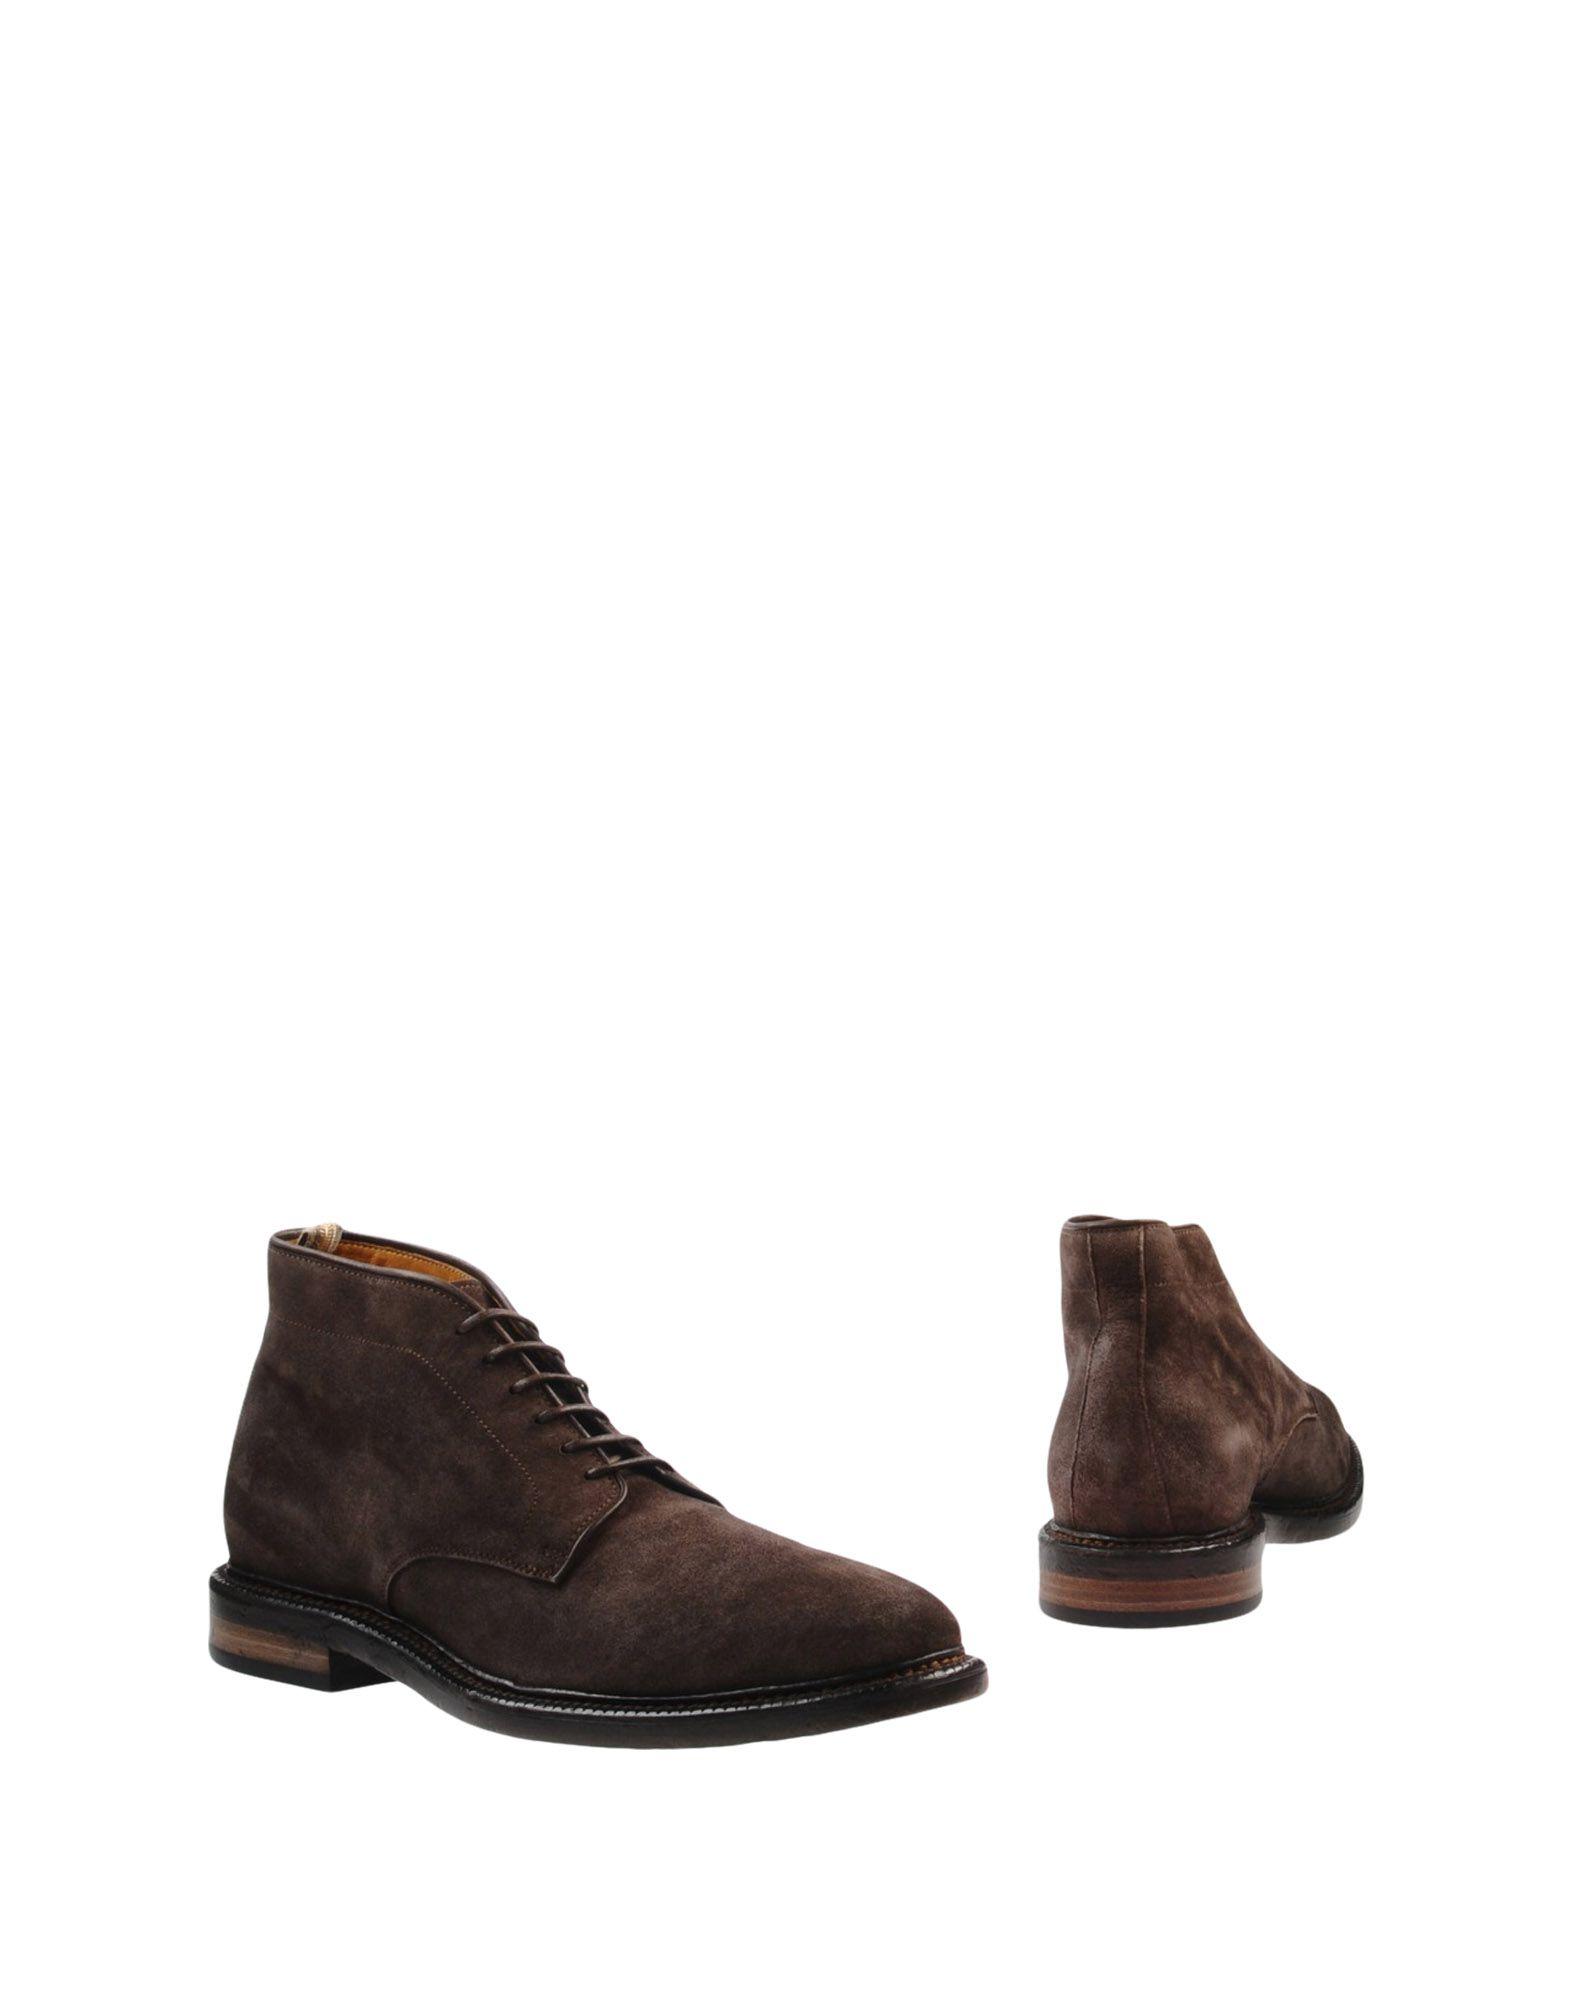 Officine Creative Italia Stiefelette Qualität Herren  11300536TB Gute Qualität Stiefelette beliebte Schuhe 56c952